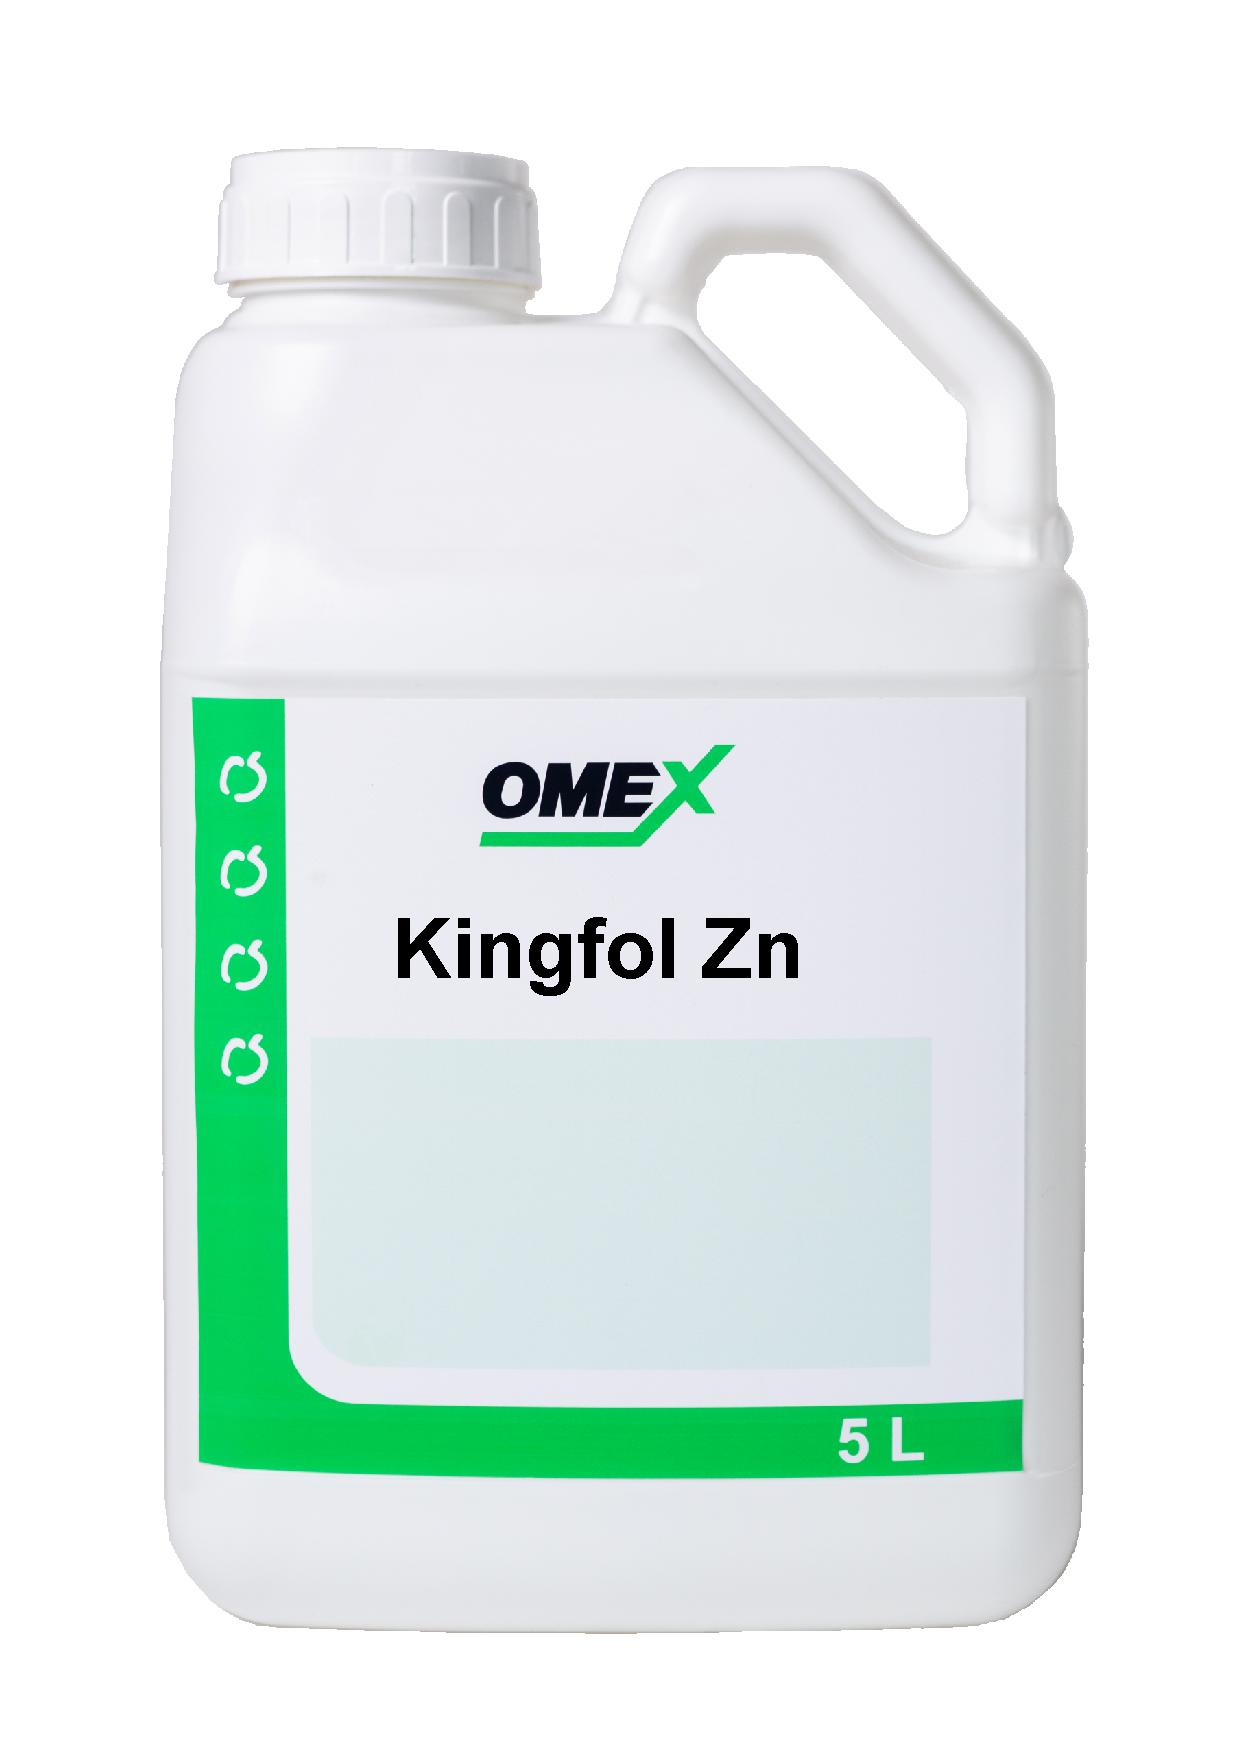 Kingfol Zinc